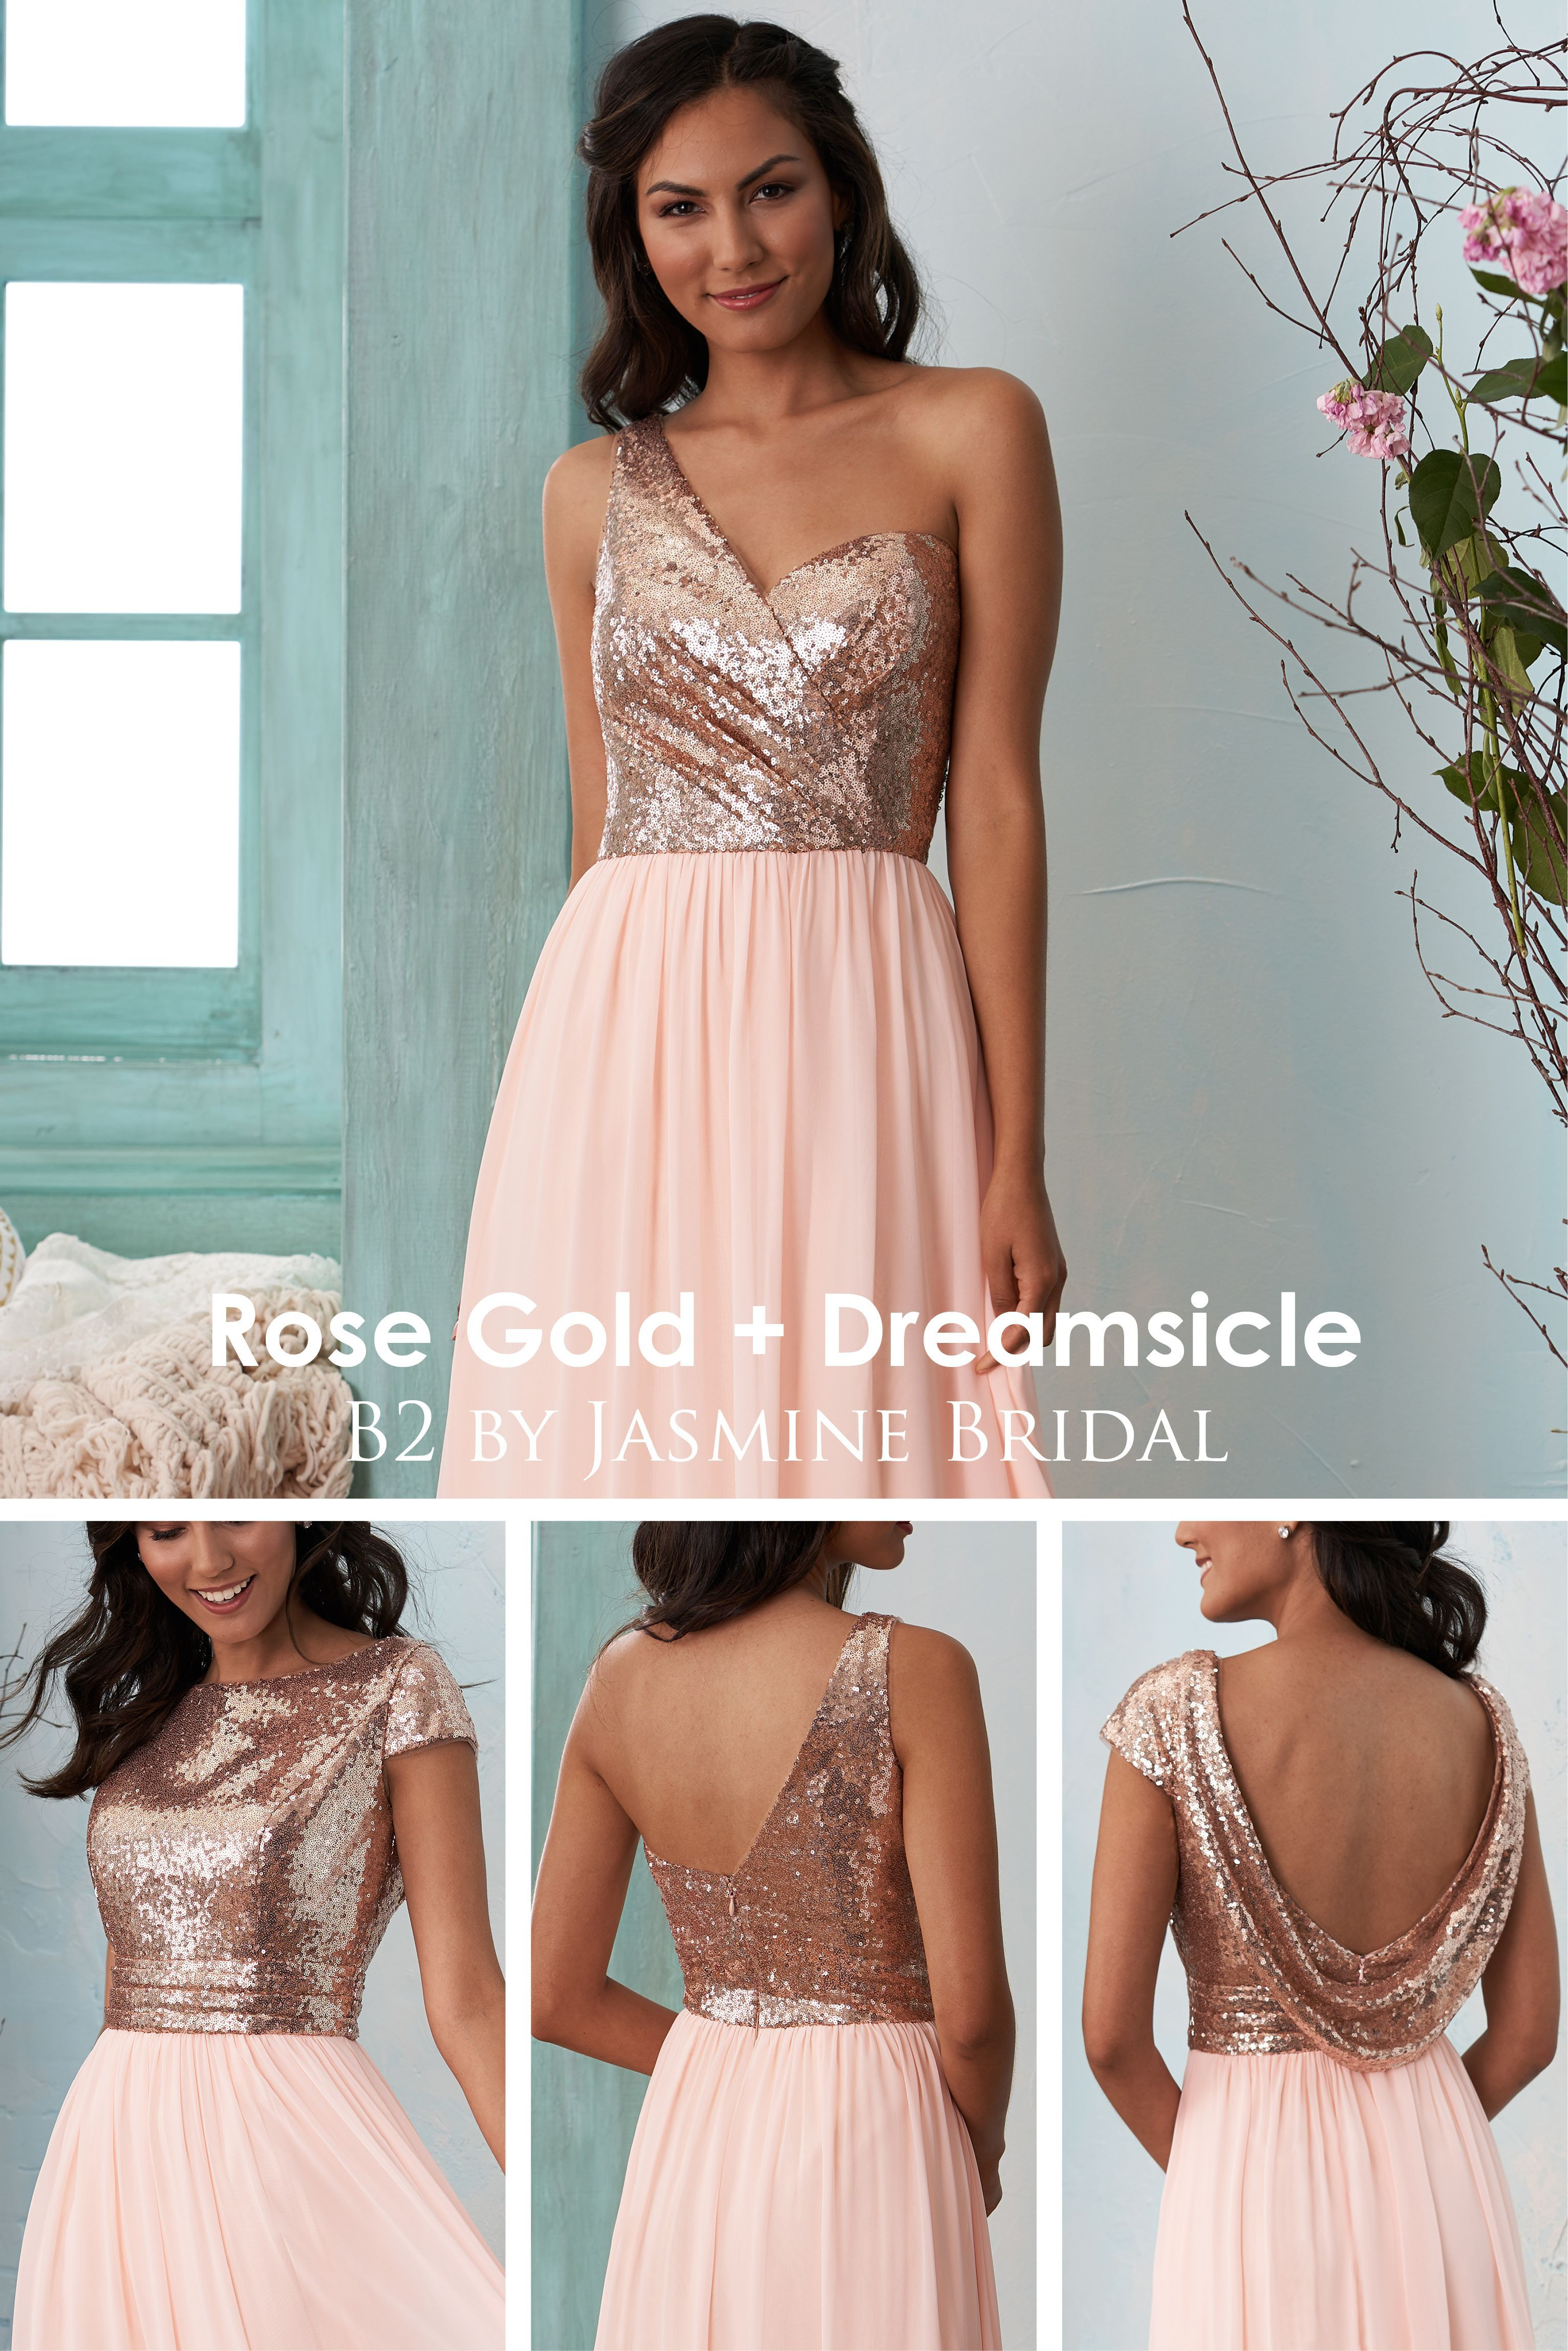 Jasmine Bridal - B14 Rose Gold + Dreamsicle Bridesmaid Dresses